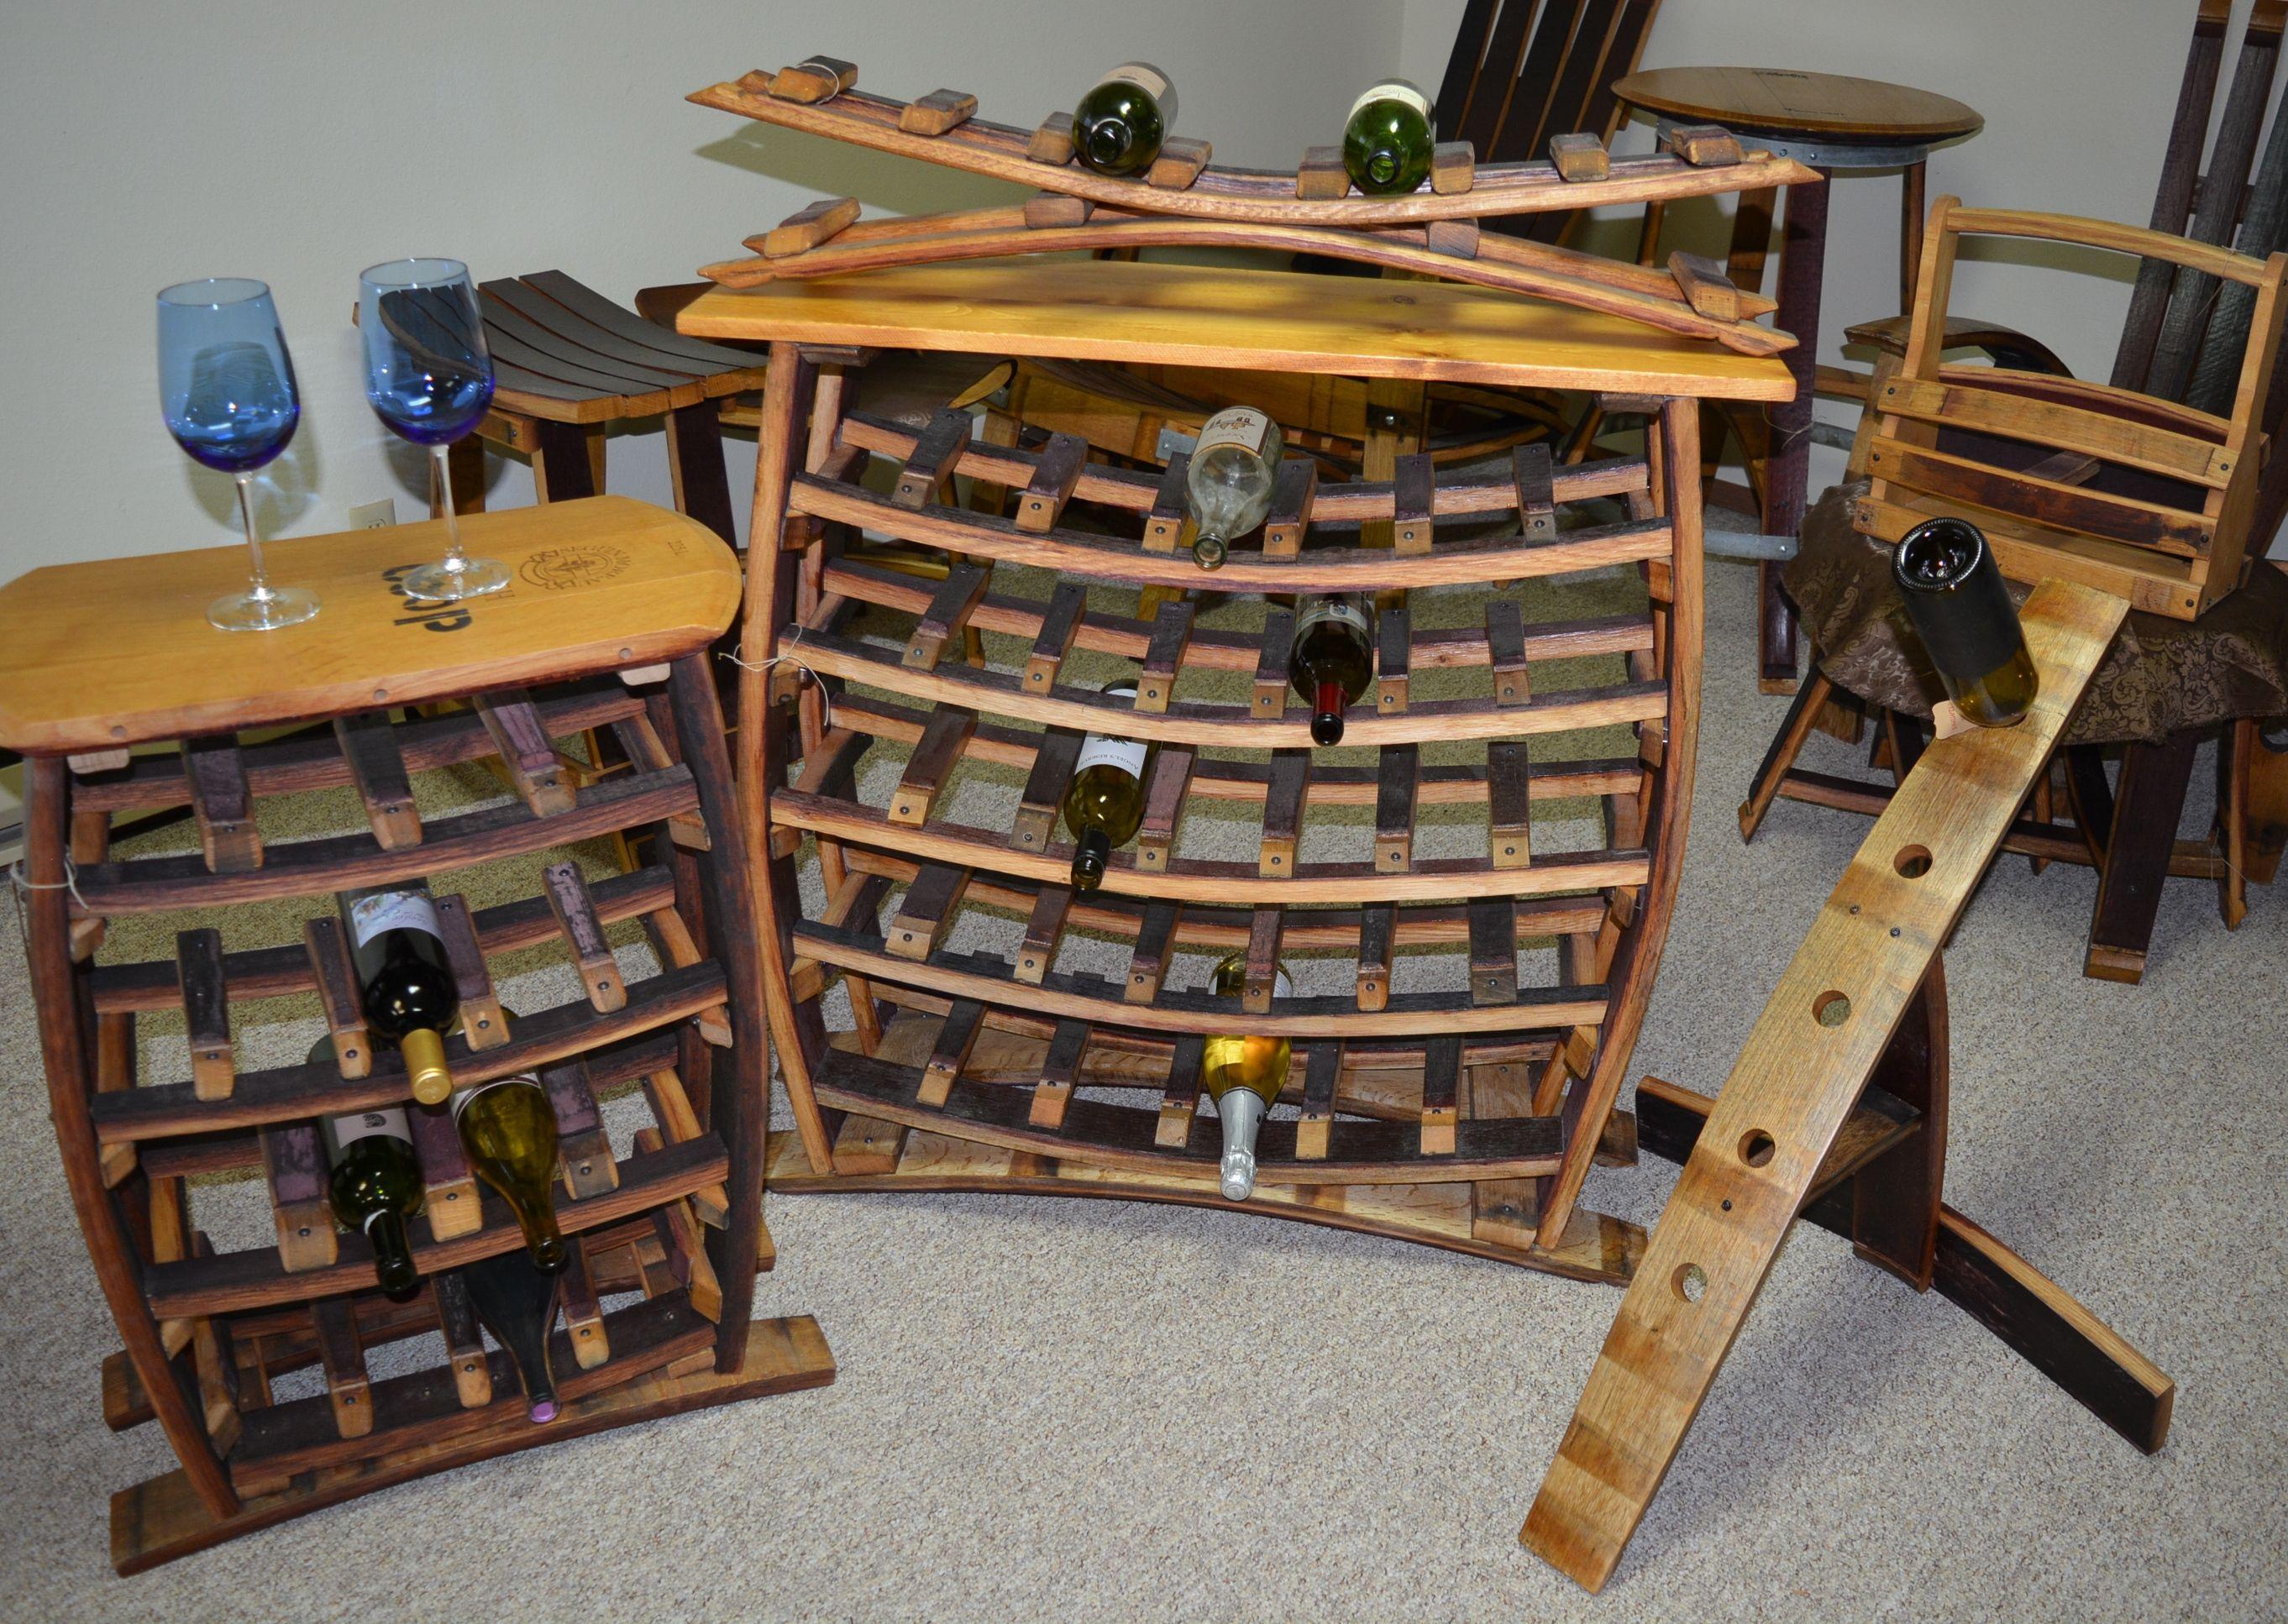 Idaho Creations Wine Barrel Furniture. Wine bottle racks.